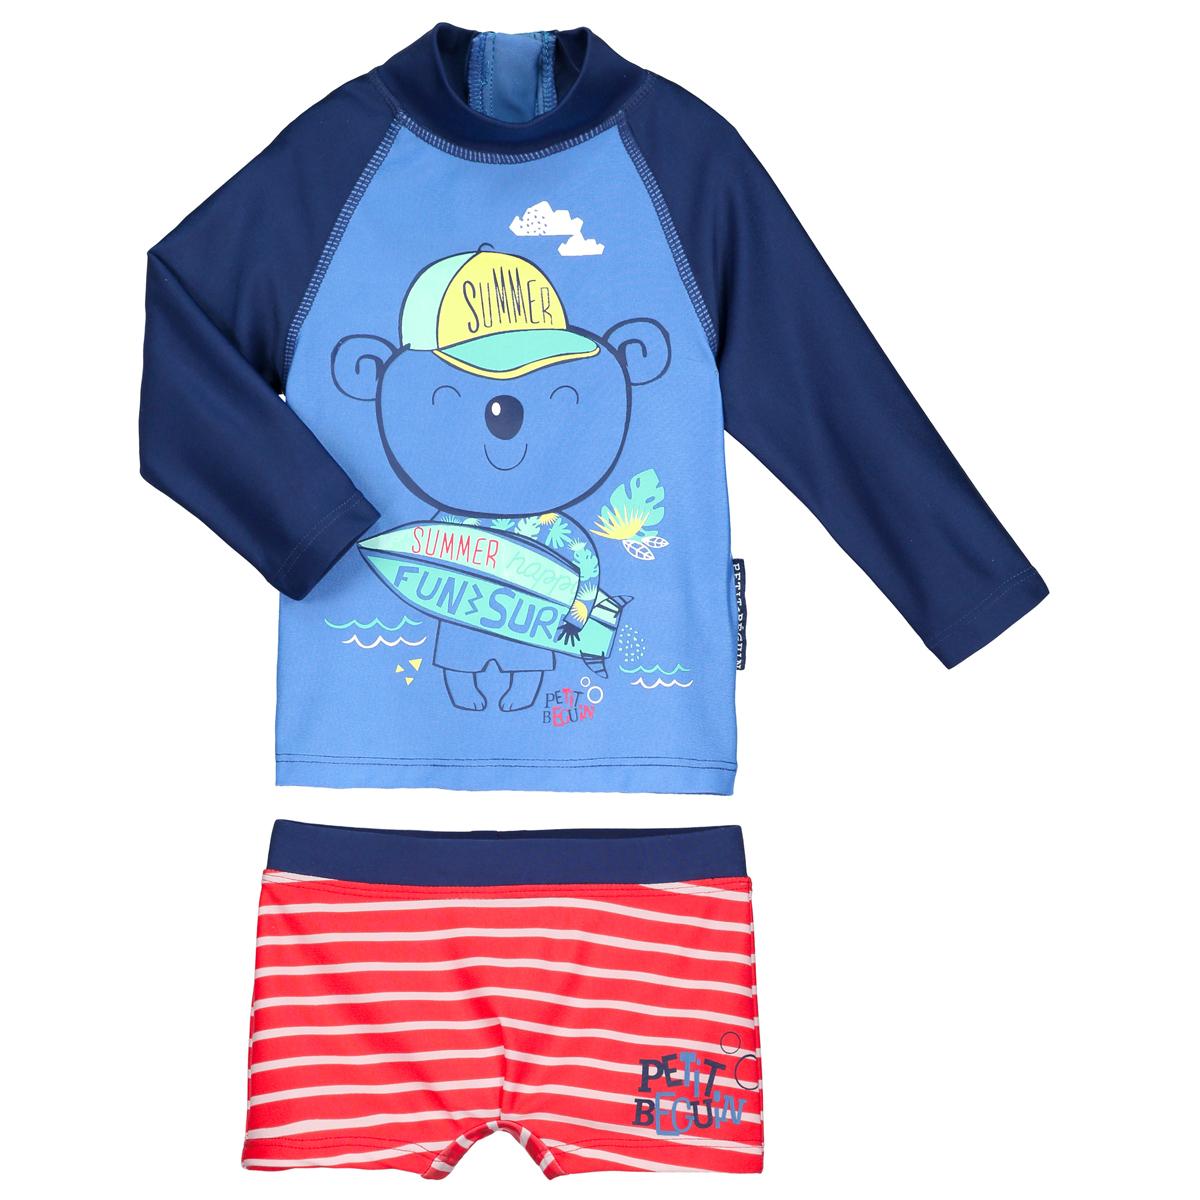 6d0c8c01b7dca Maillot de bain ANTI-UV 2 pièces t-shirt   slip bébé garçon Happy Summ